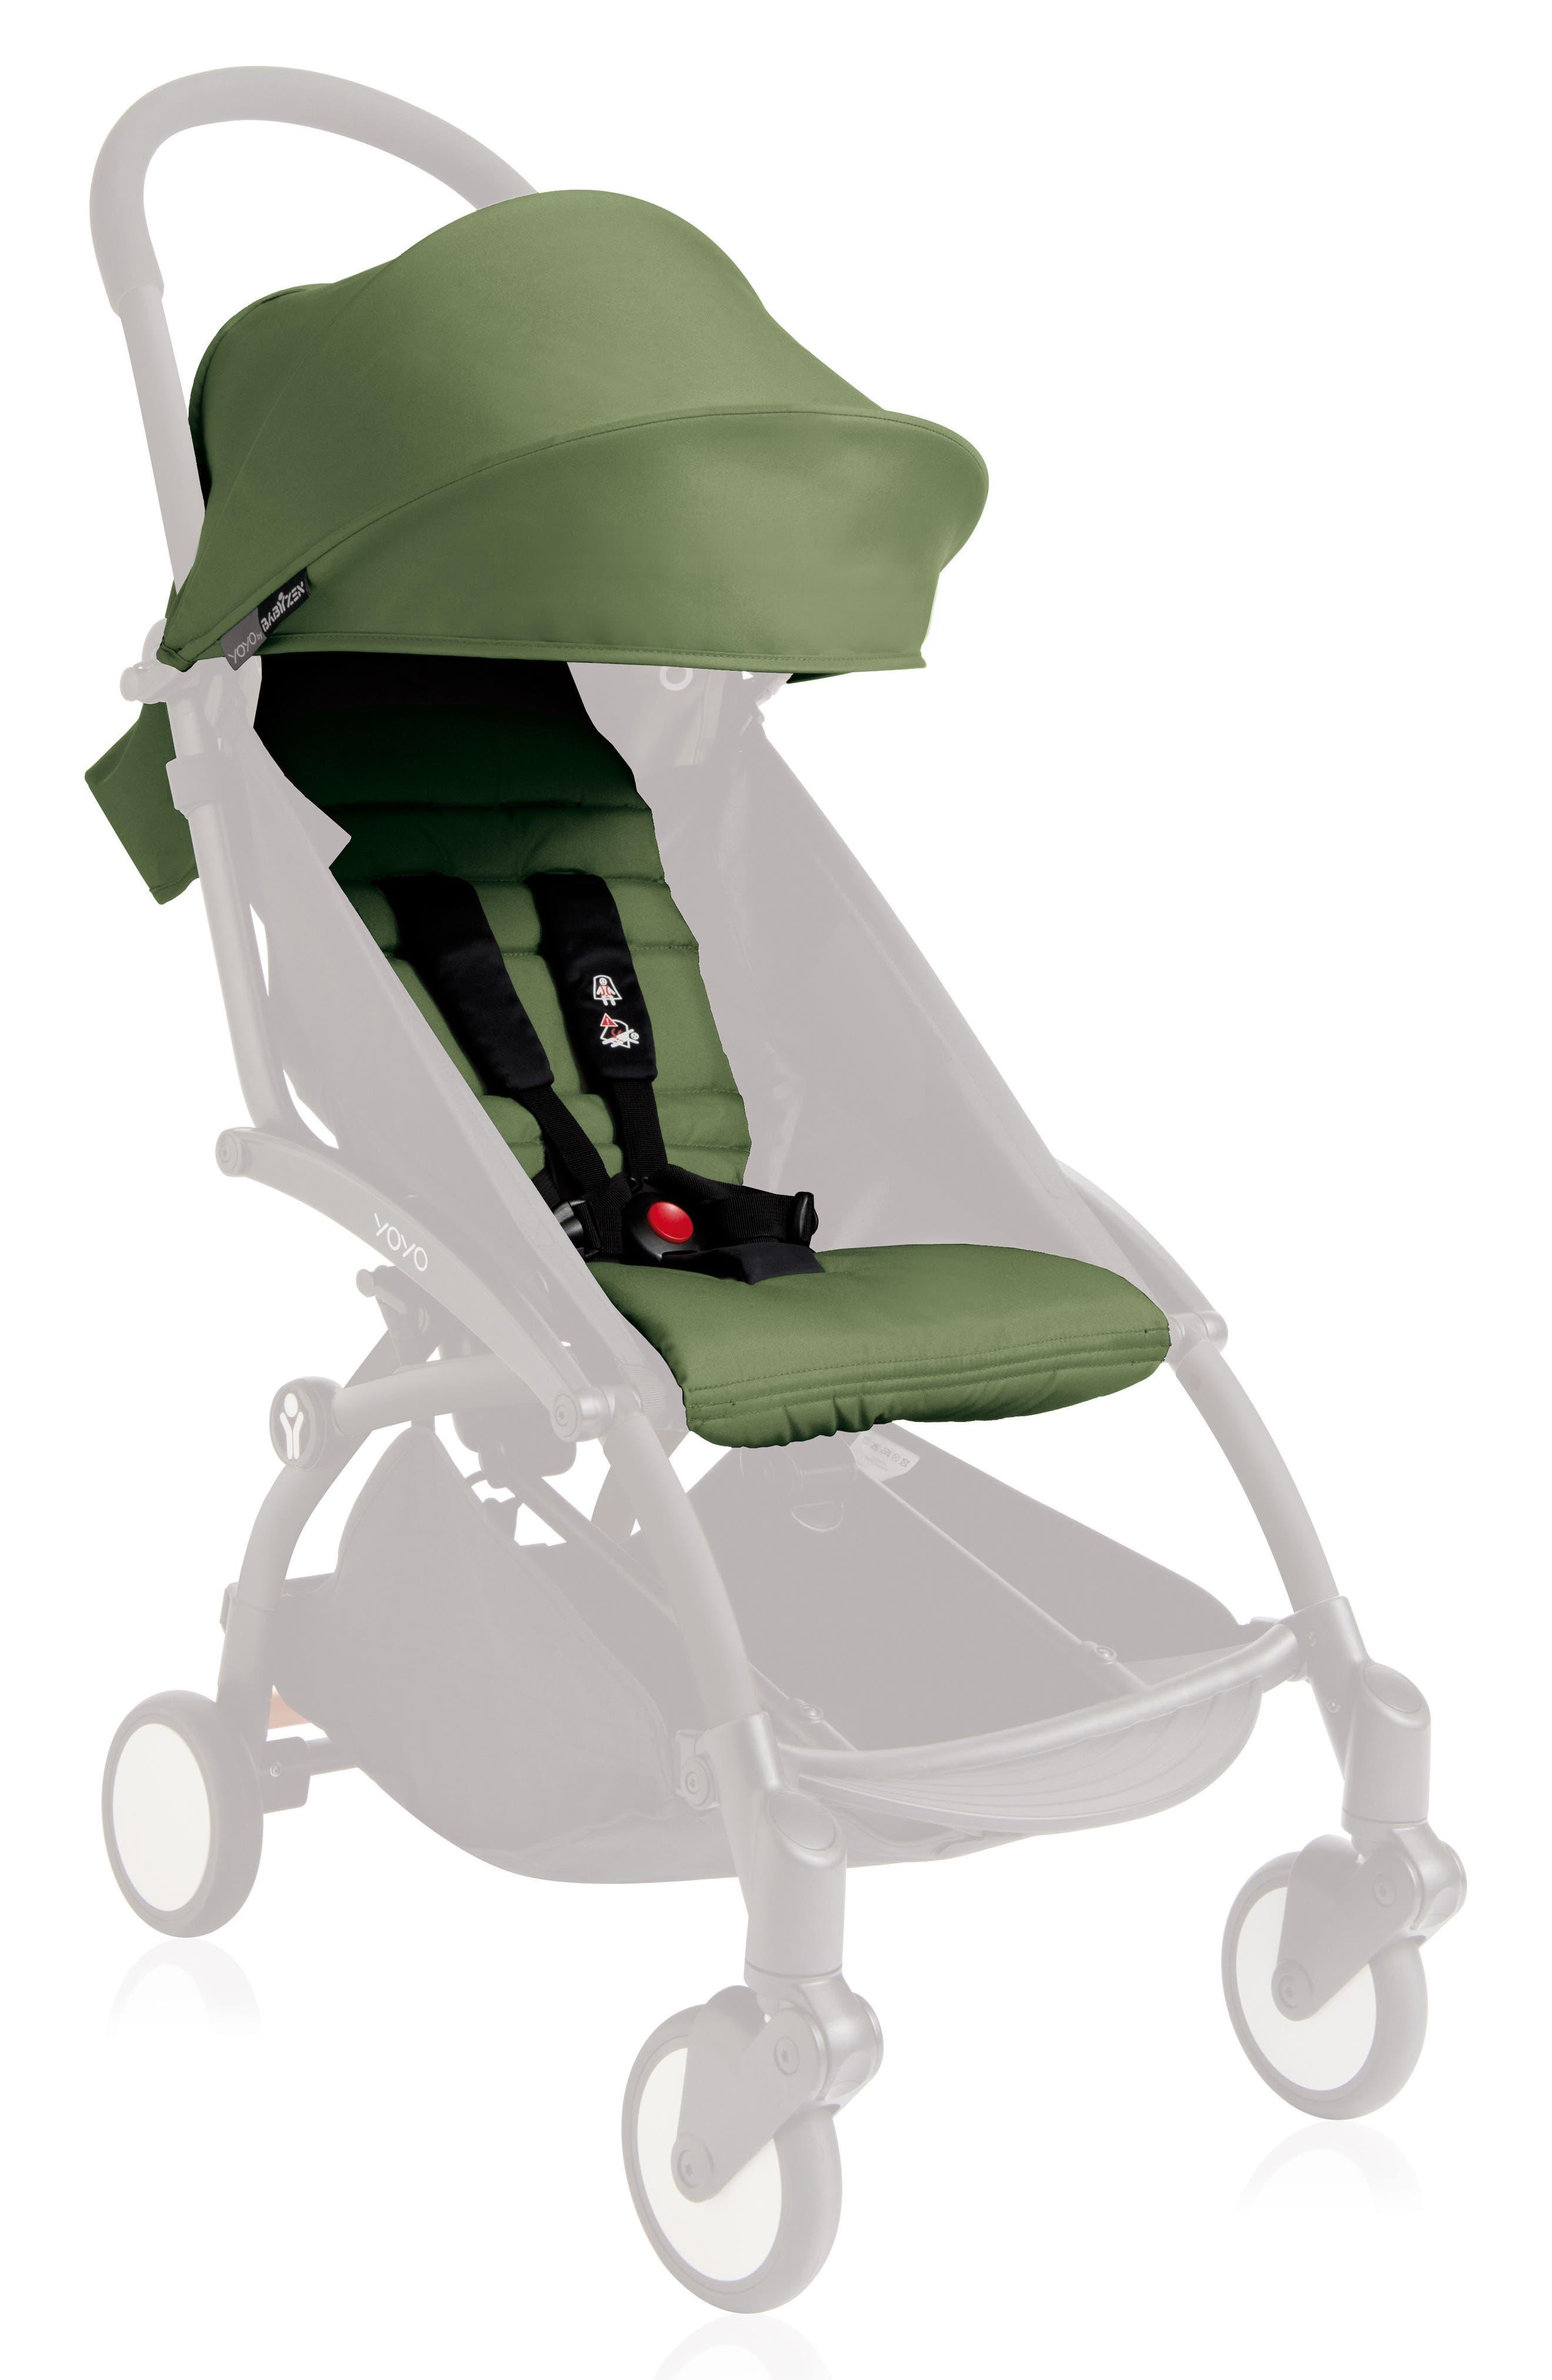 BABYZEN YOYO+ Color Pack Seat/Fabric Set for BABYZEN YOYO+ Stroller Frame